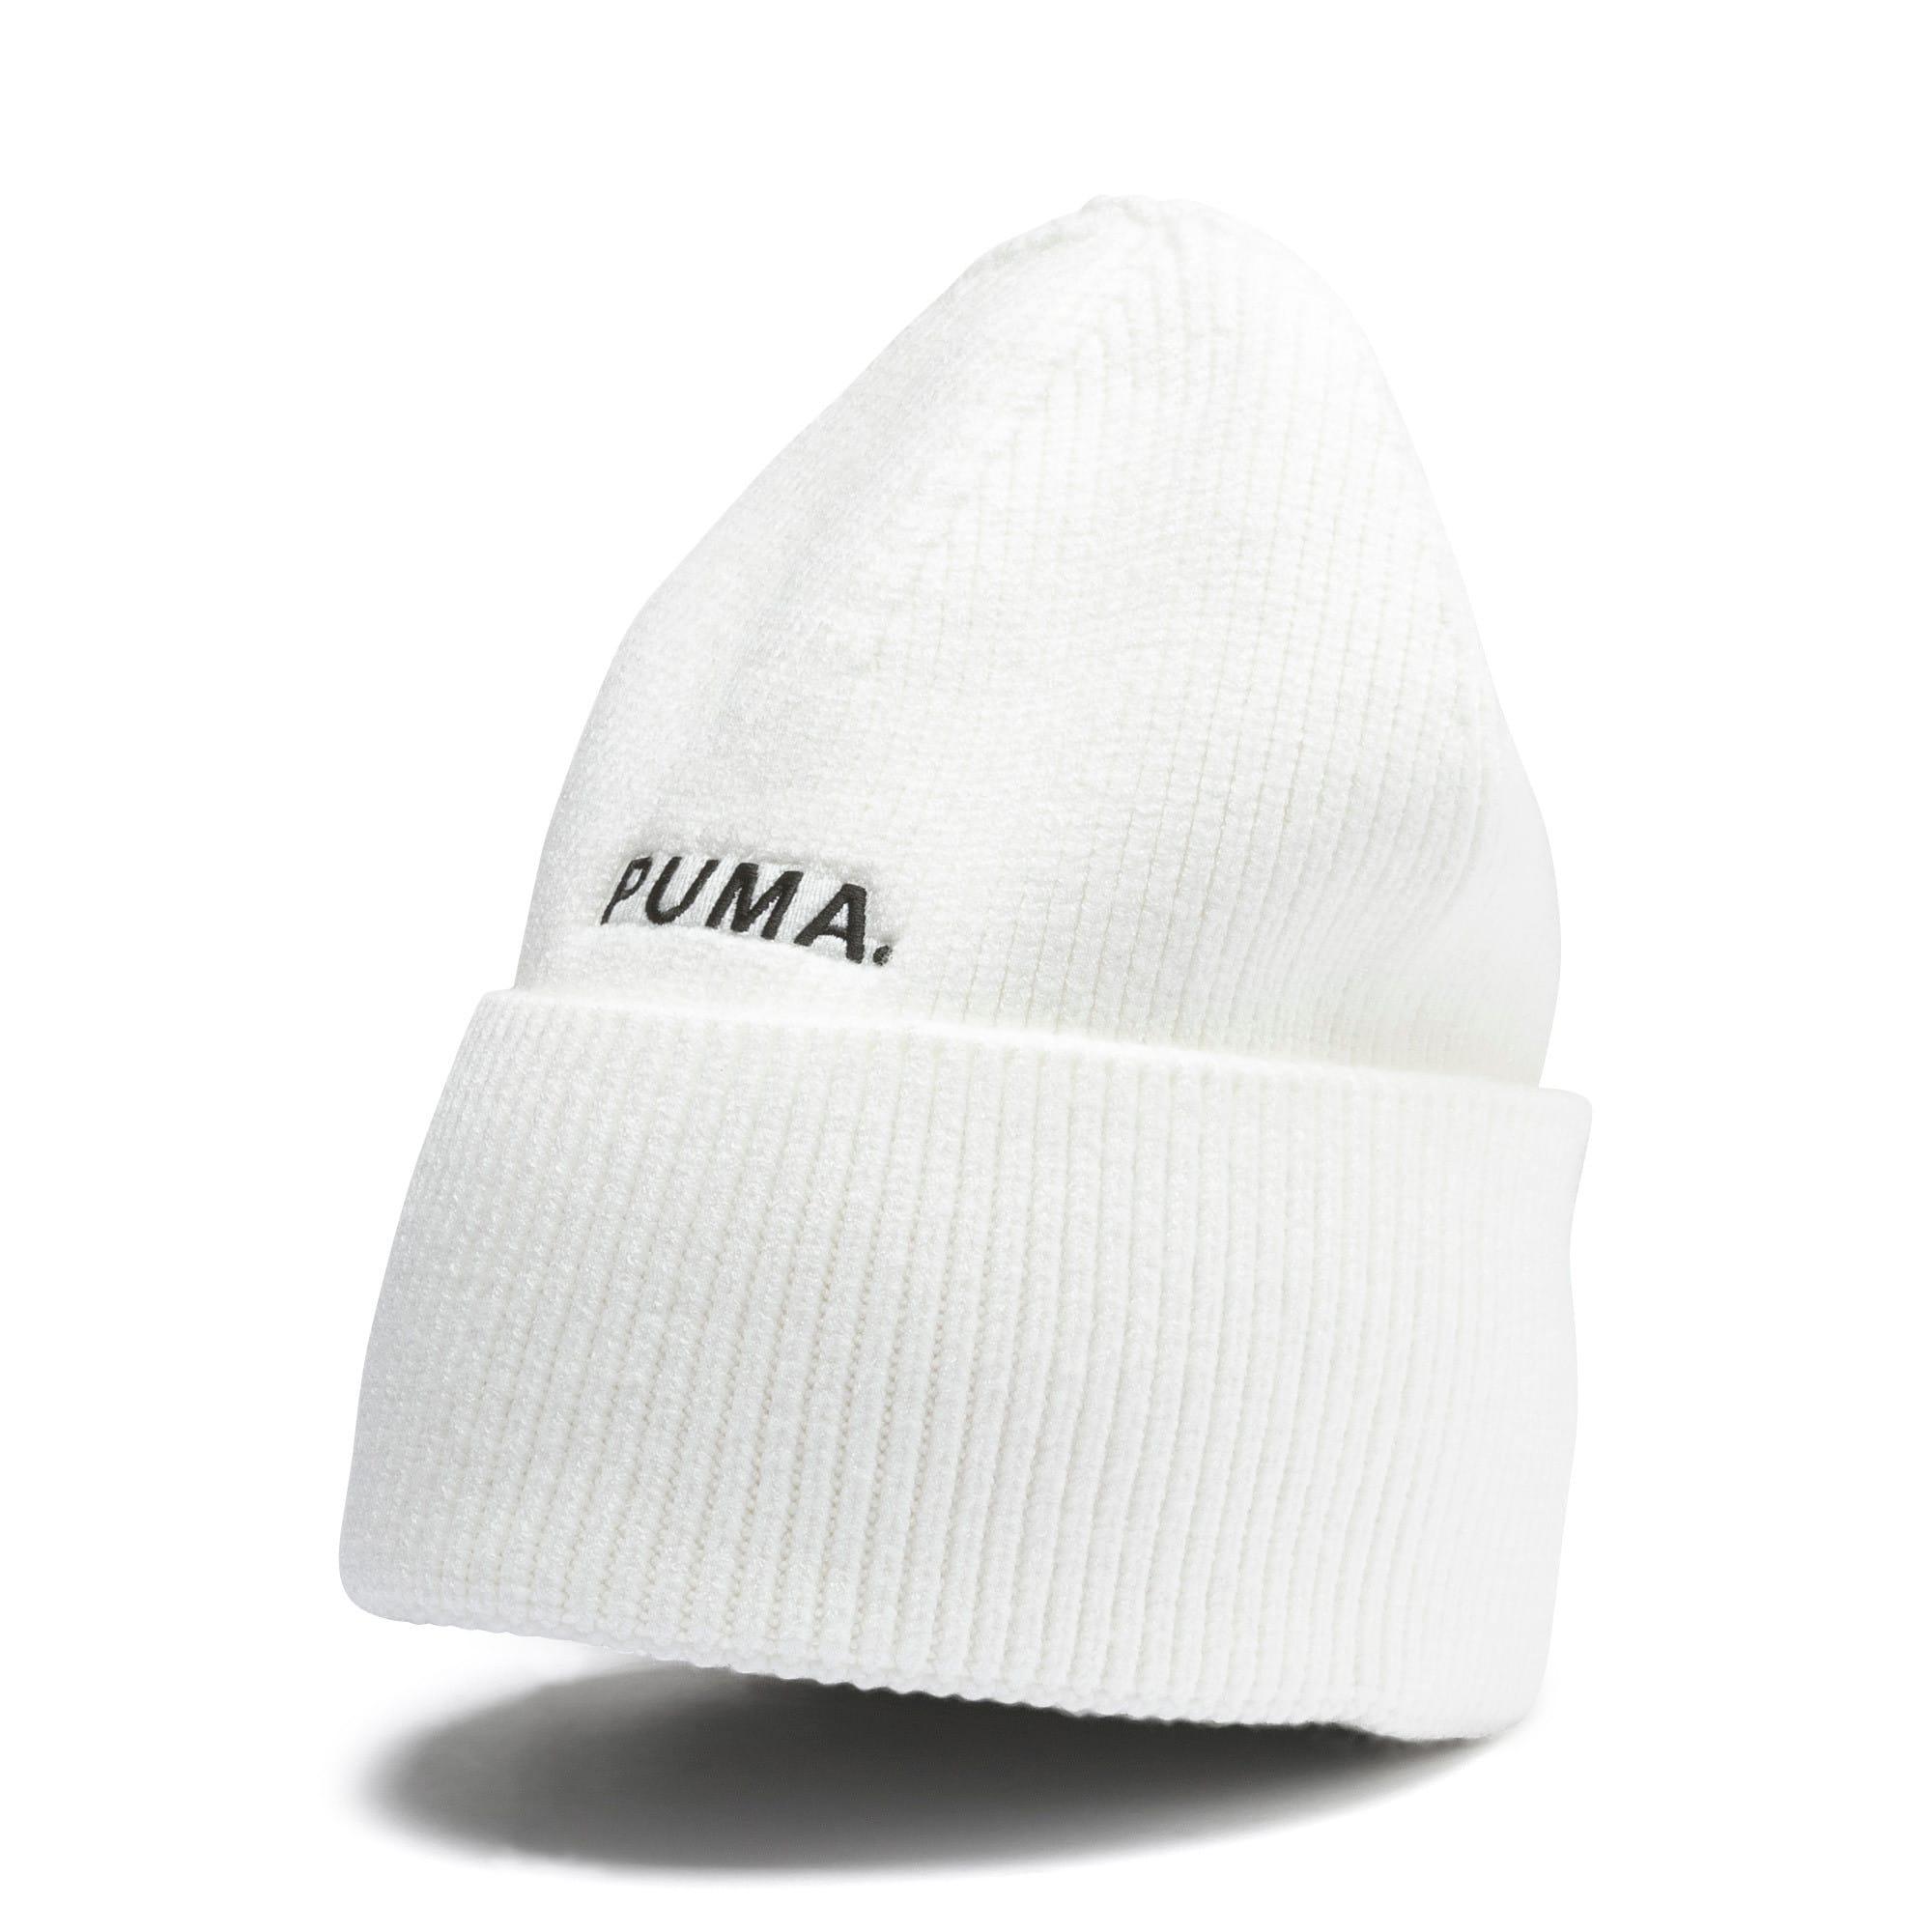 Thumbnail 1 of ハイブリッド フィット ウィメンズ トレンド ビーニー, Puma White, medium-JPN